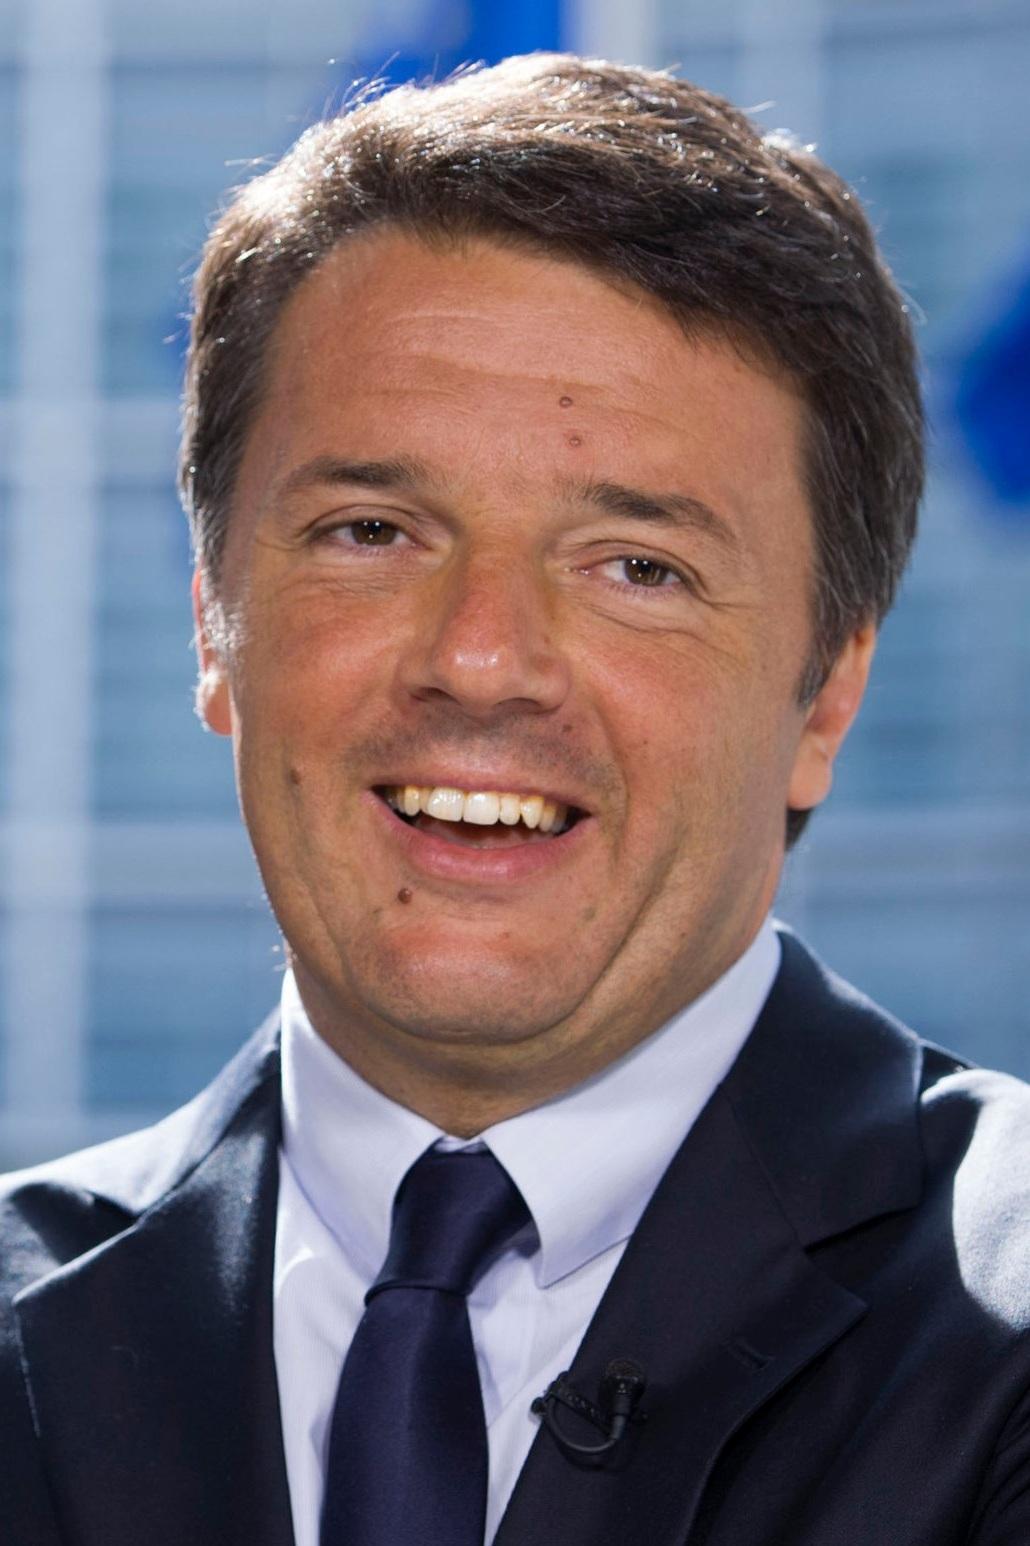 MATTEO RENZI   Prime Minister of Italy (2014-2016)